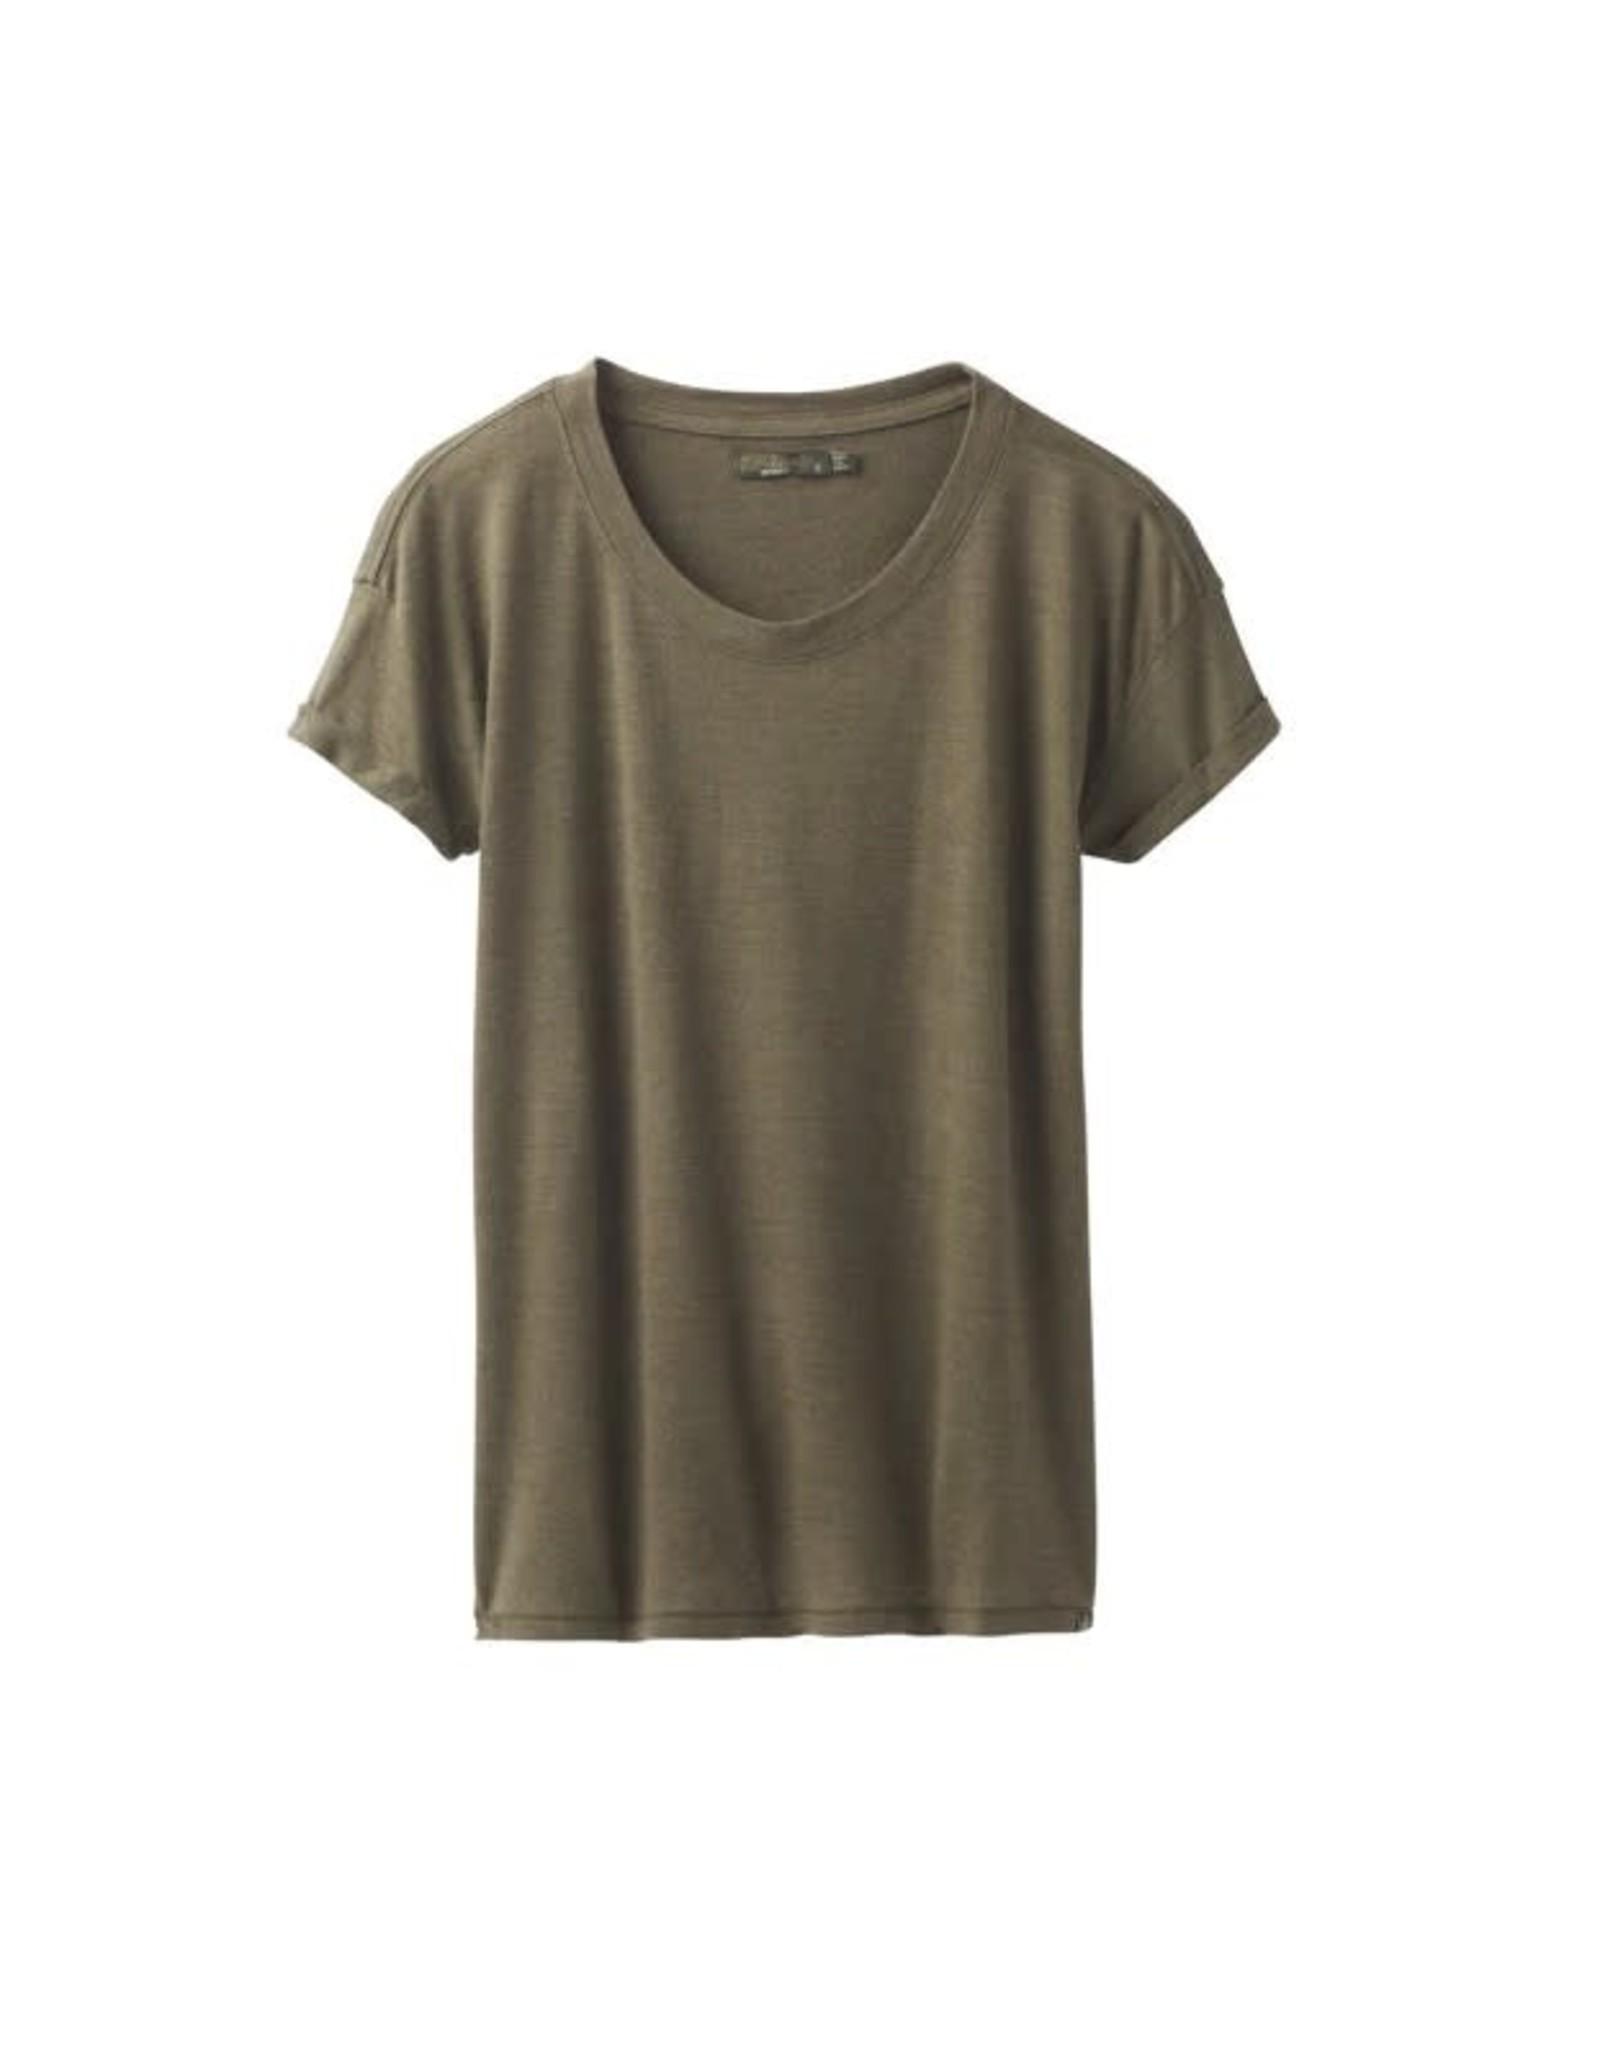 Prana Prana Cozy Up T-shirt